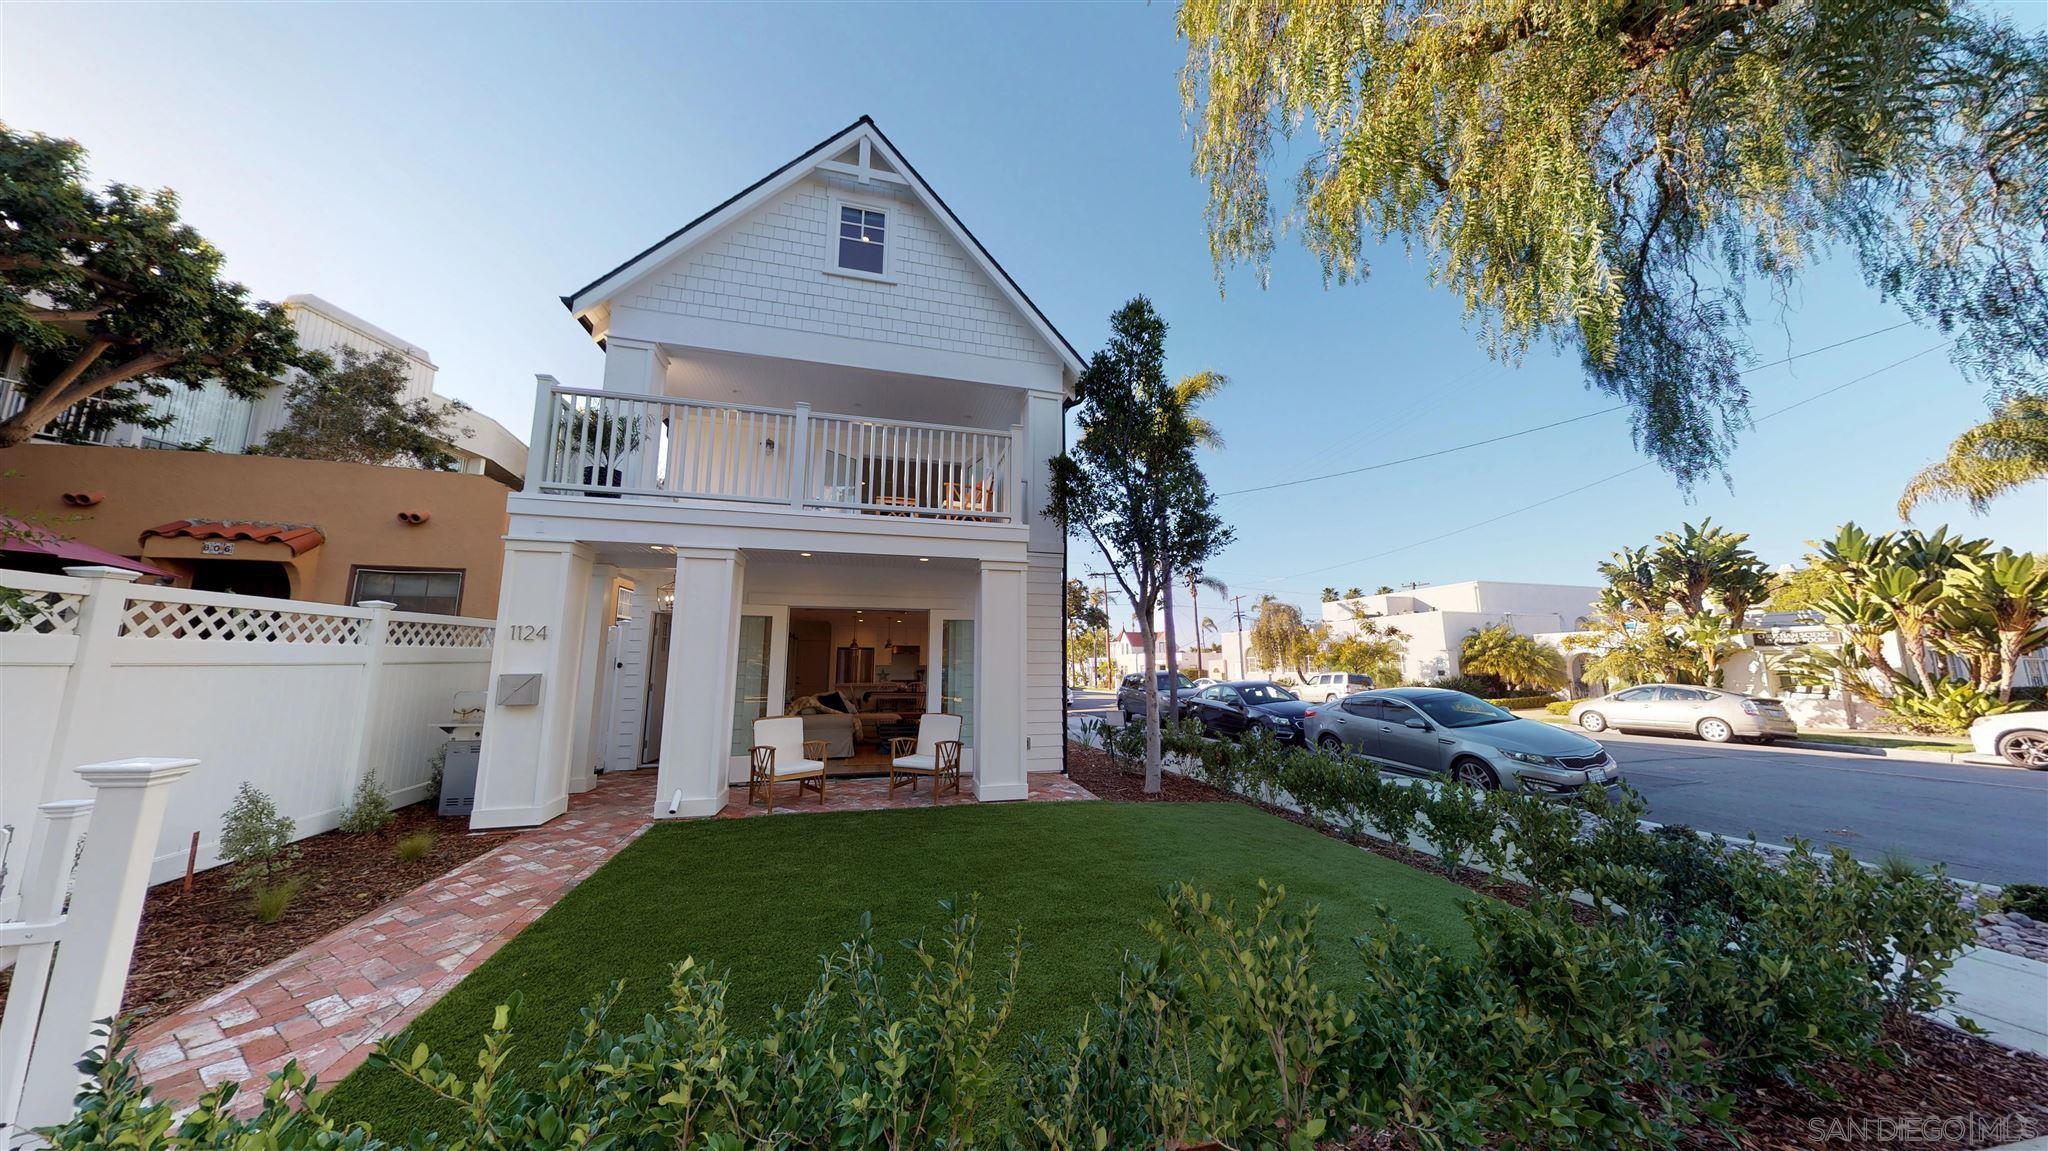 Main Photo: CORONADO VILLAGE House for sale : 4 bedrooms : 1124 8Th St in Coronado